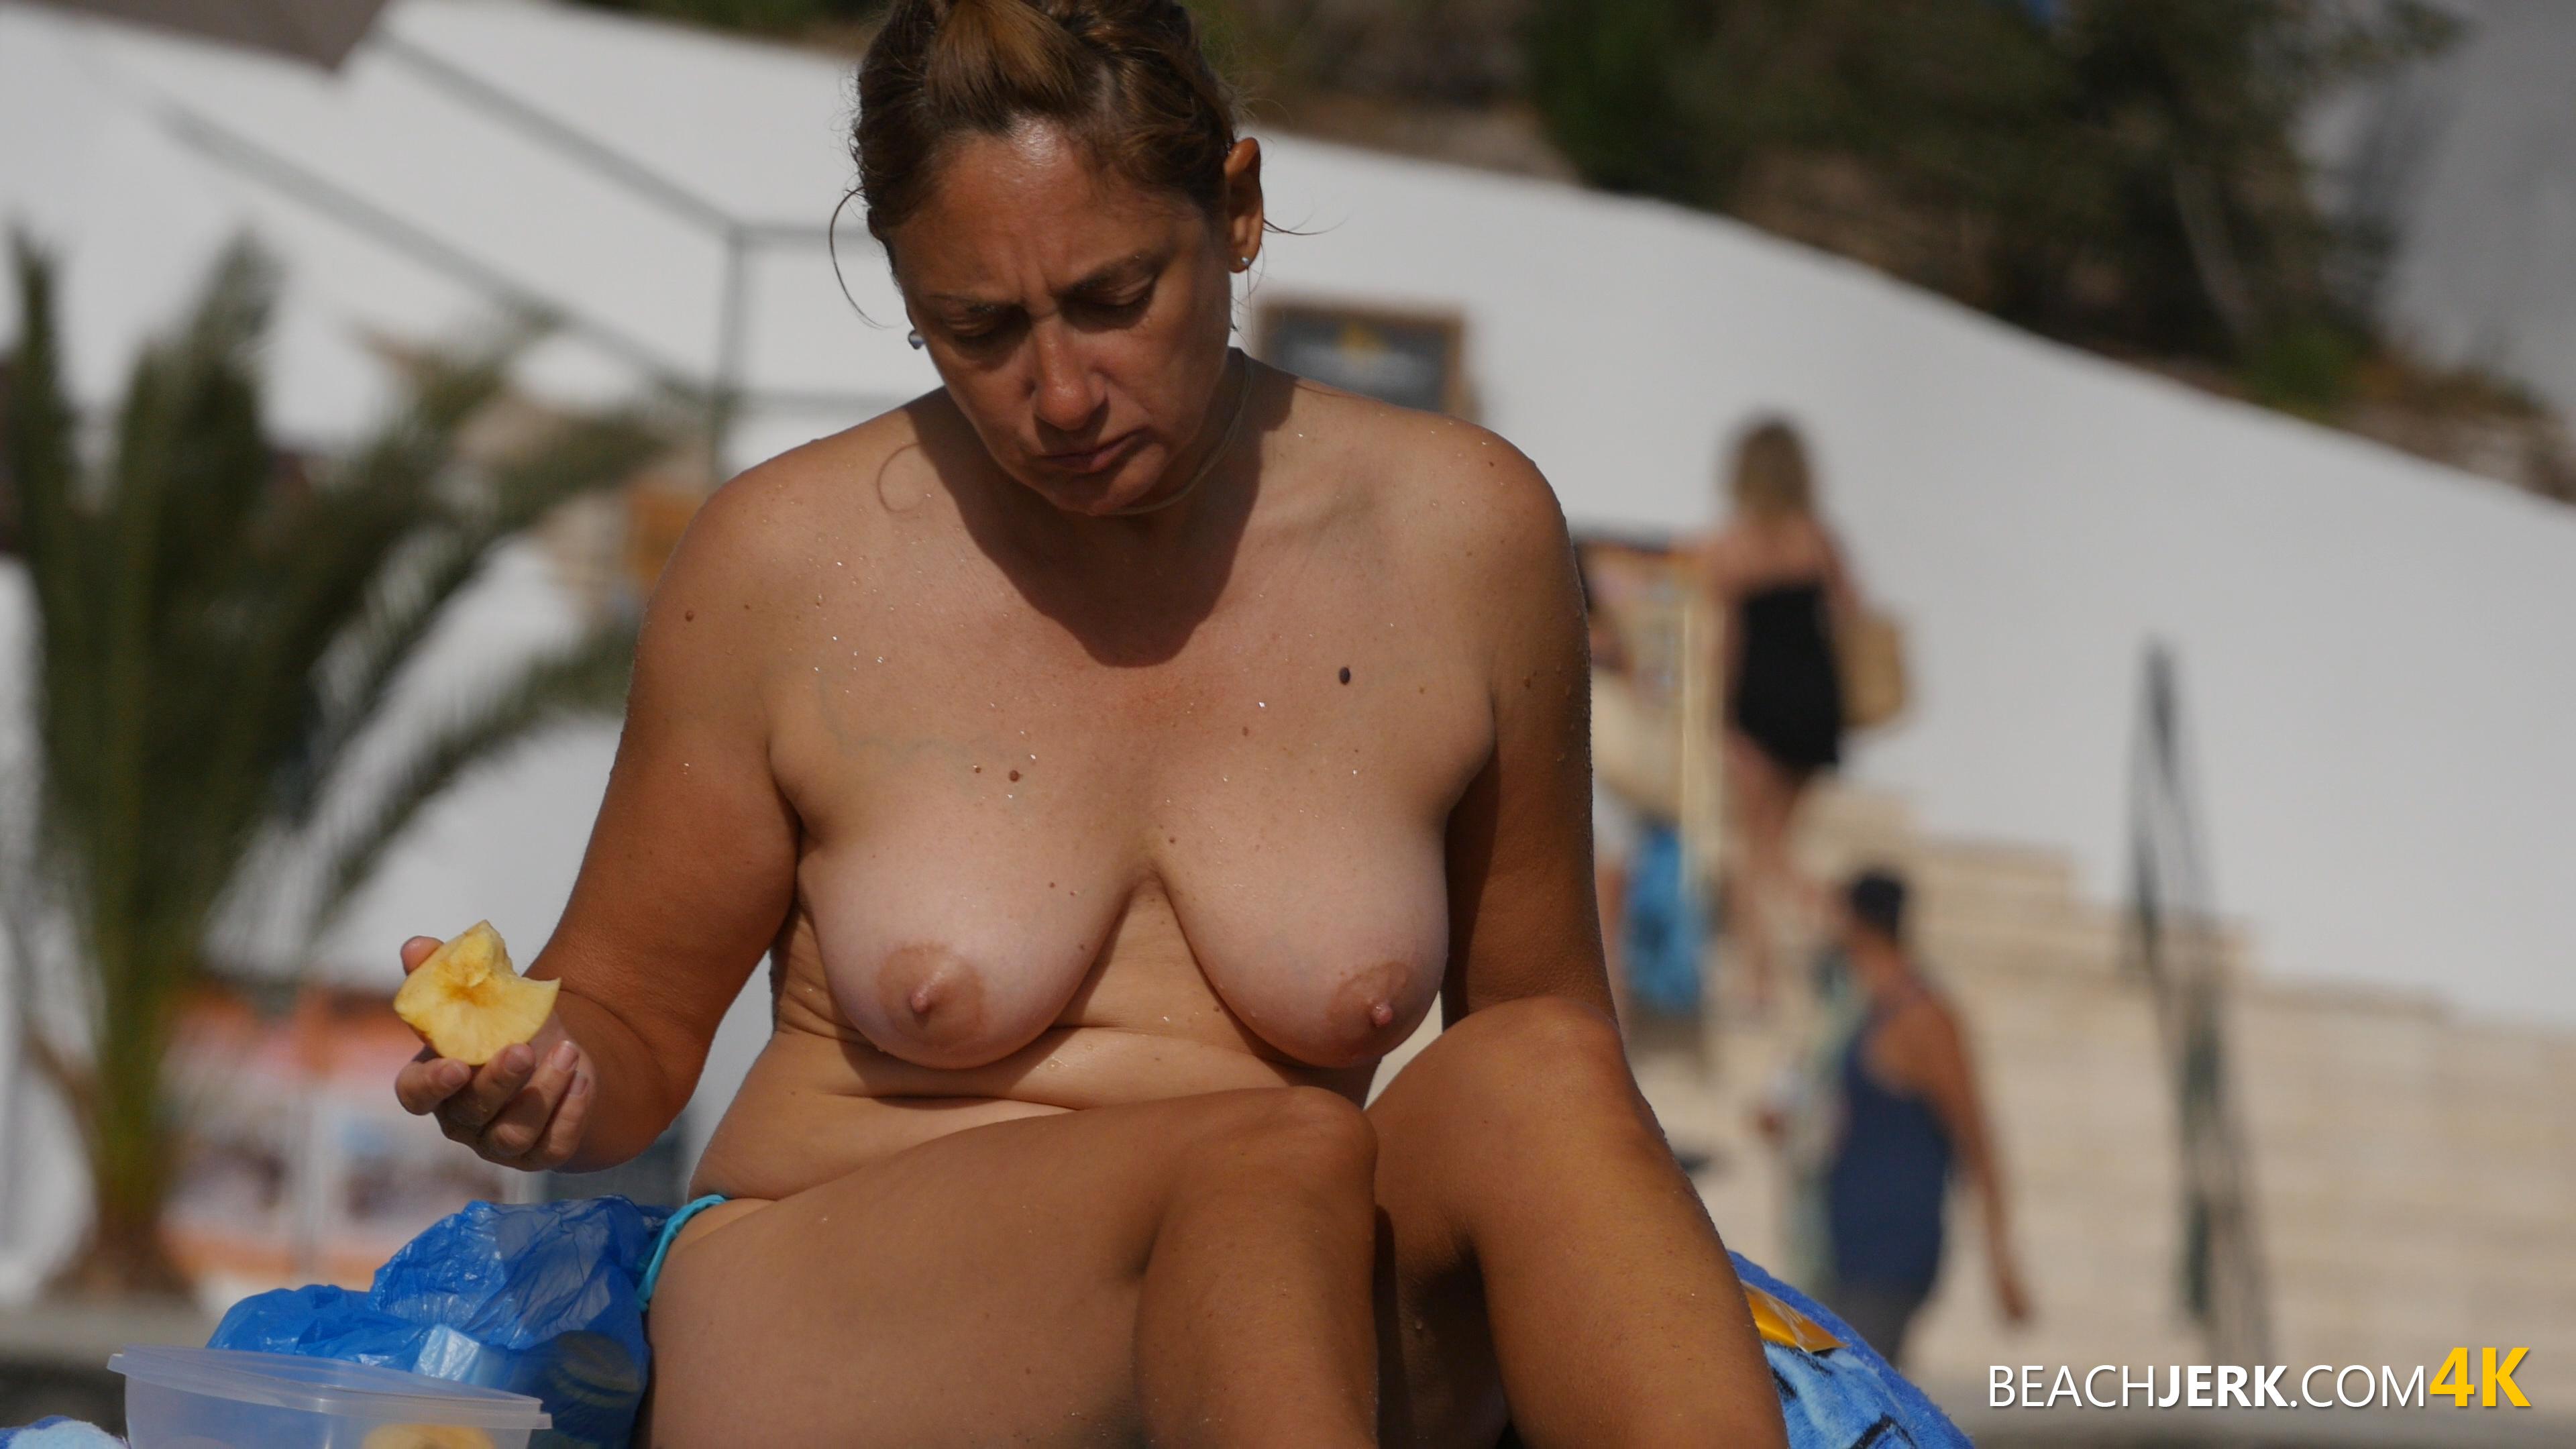 Naked seduced straight men gay i mentioned 2